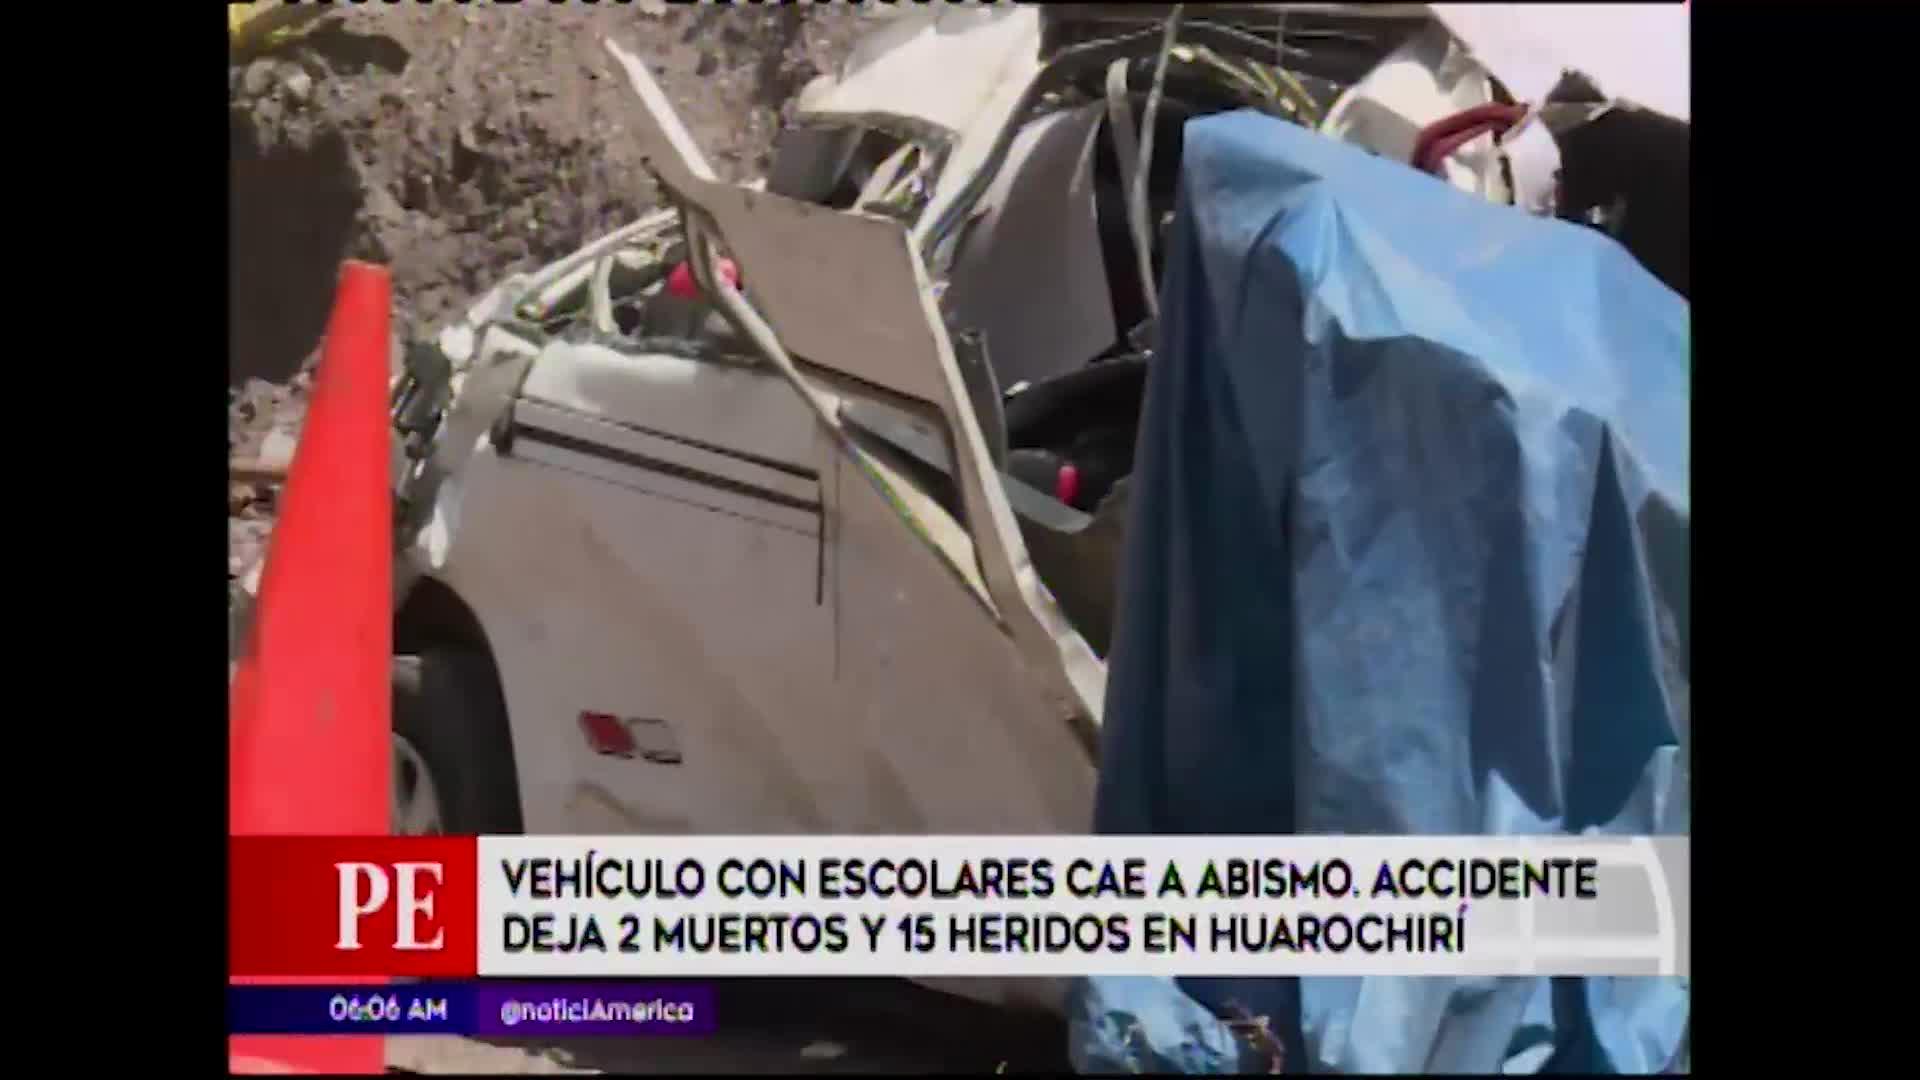 Huarochirí: quince heridos y dos muertos deja despiste de miniván con escolares a bordo